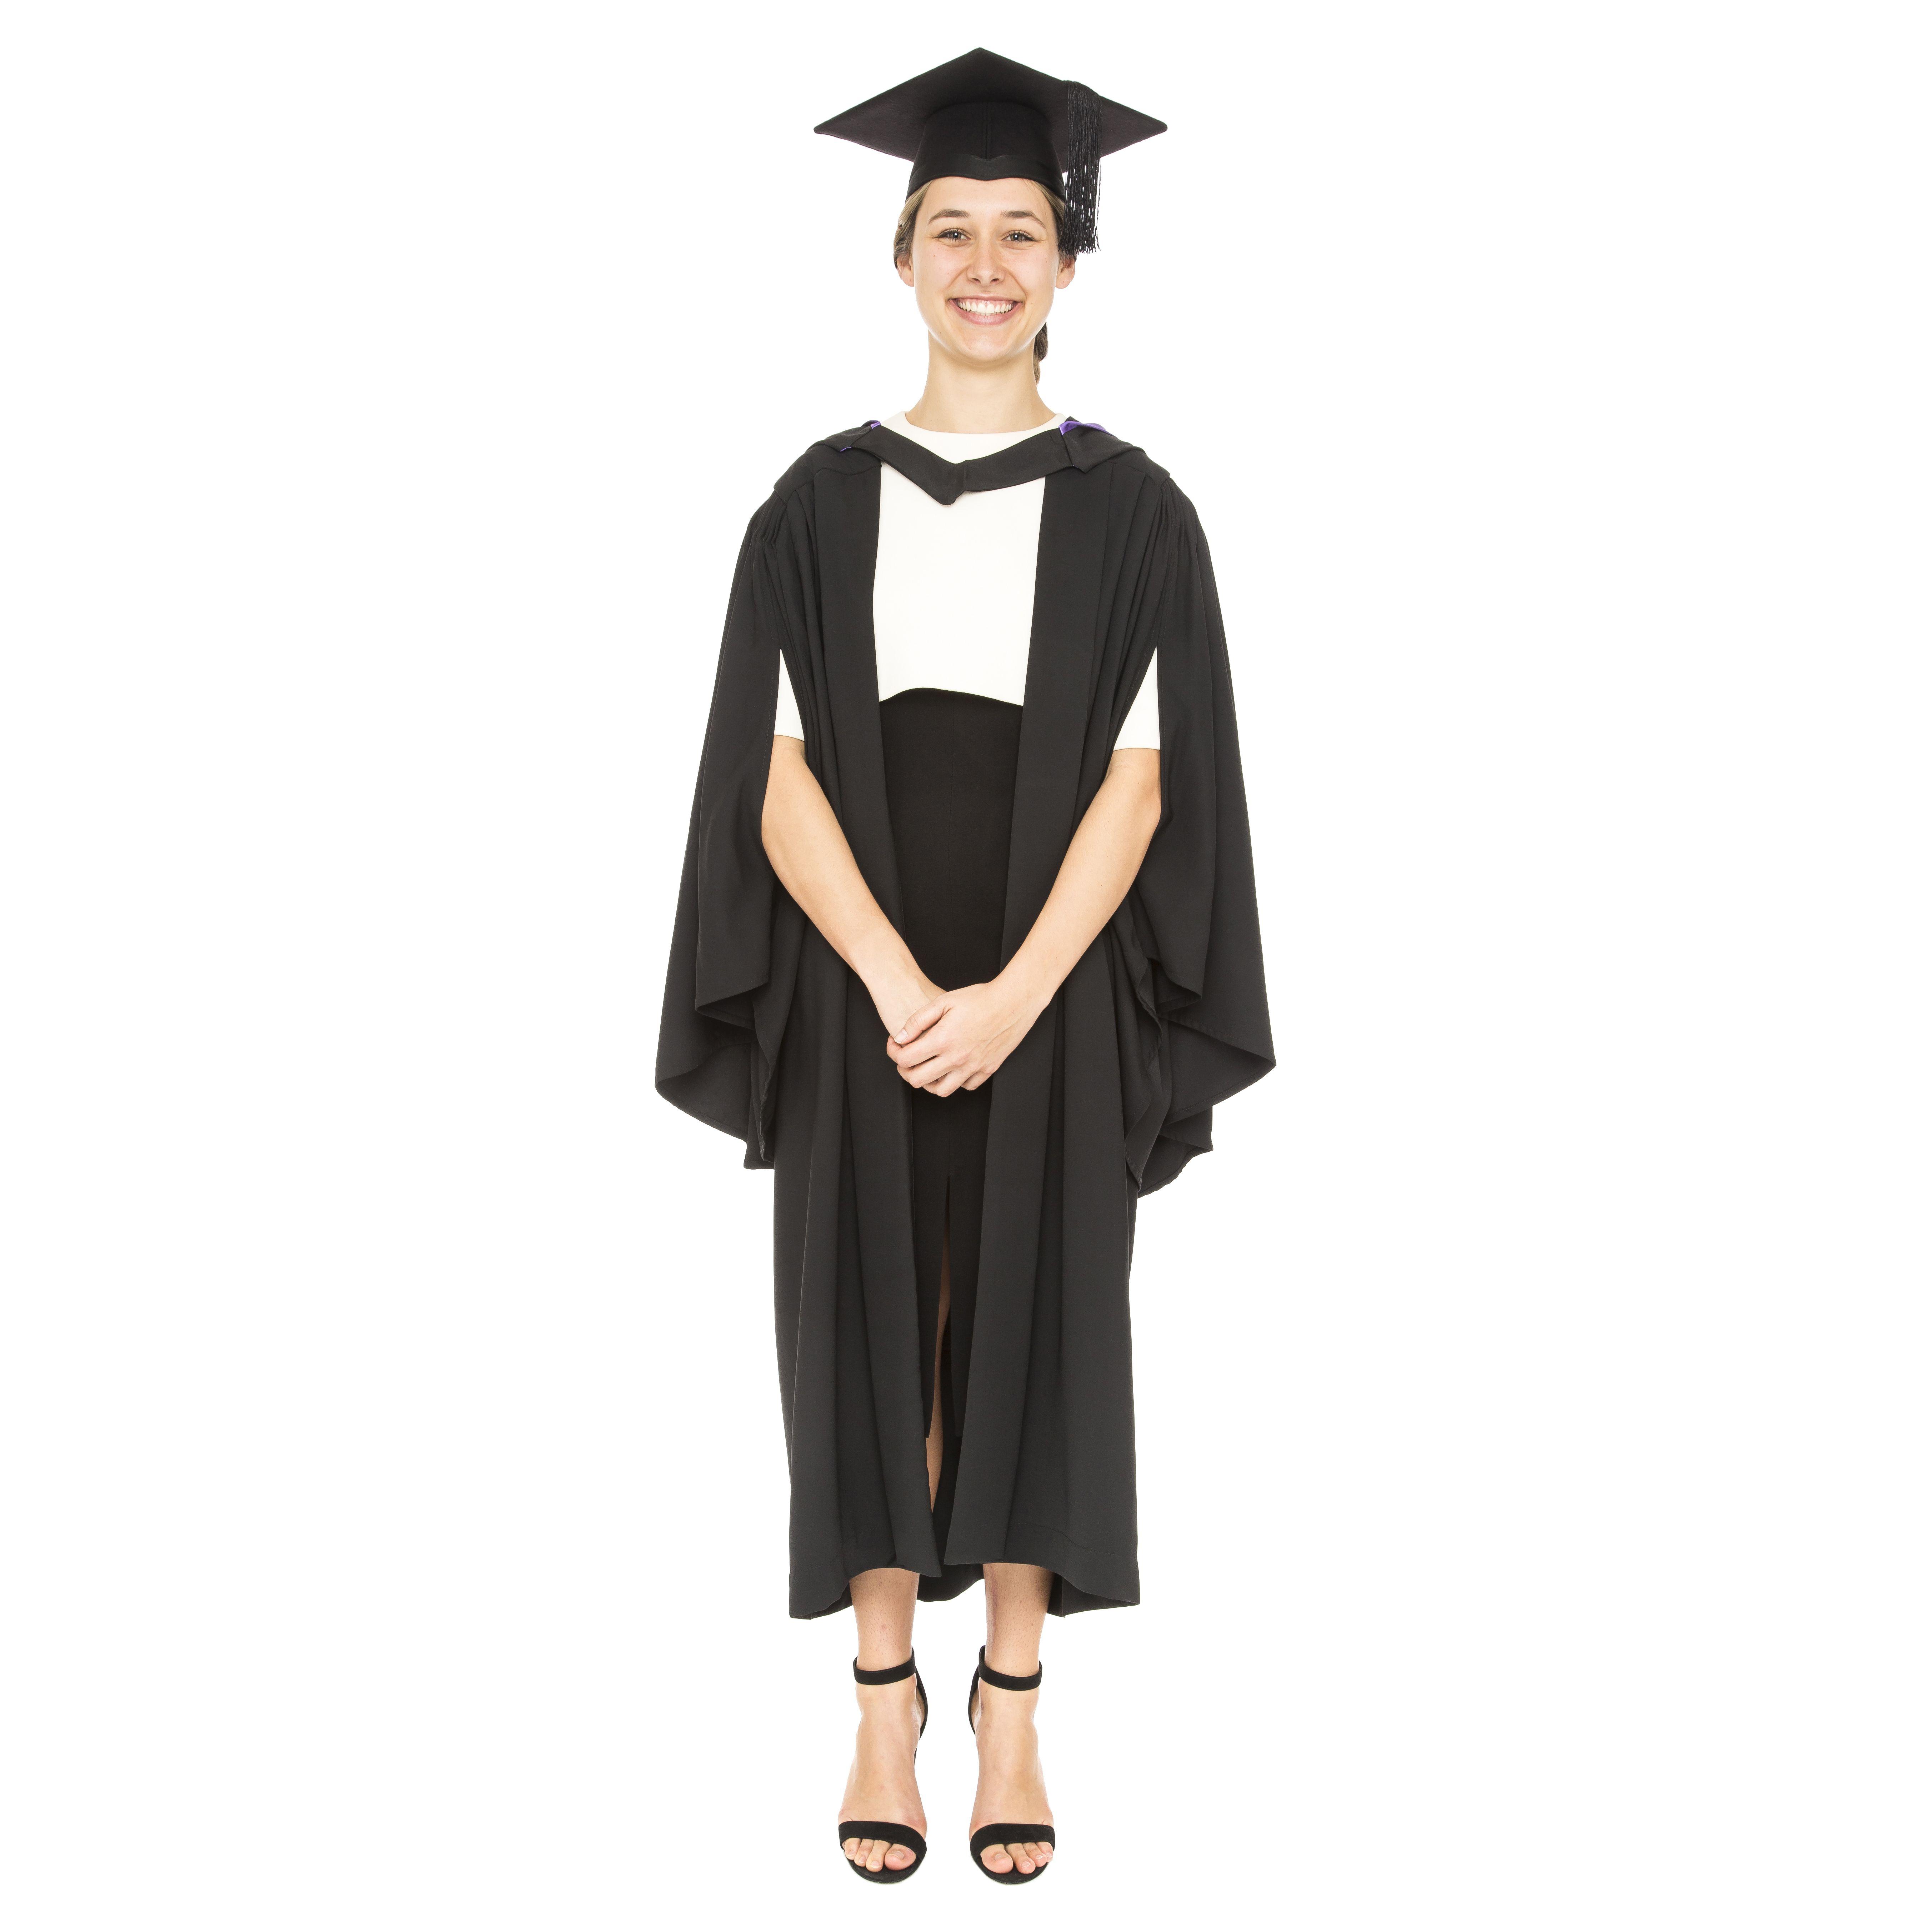 Full graduation set. Gown, hood and Mortarboard | Graduation Attire ...